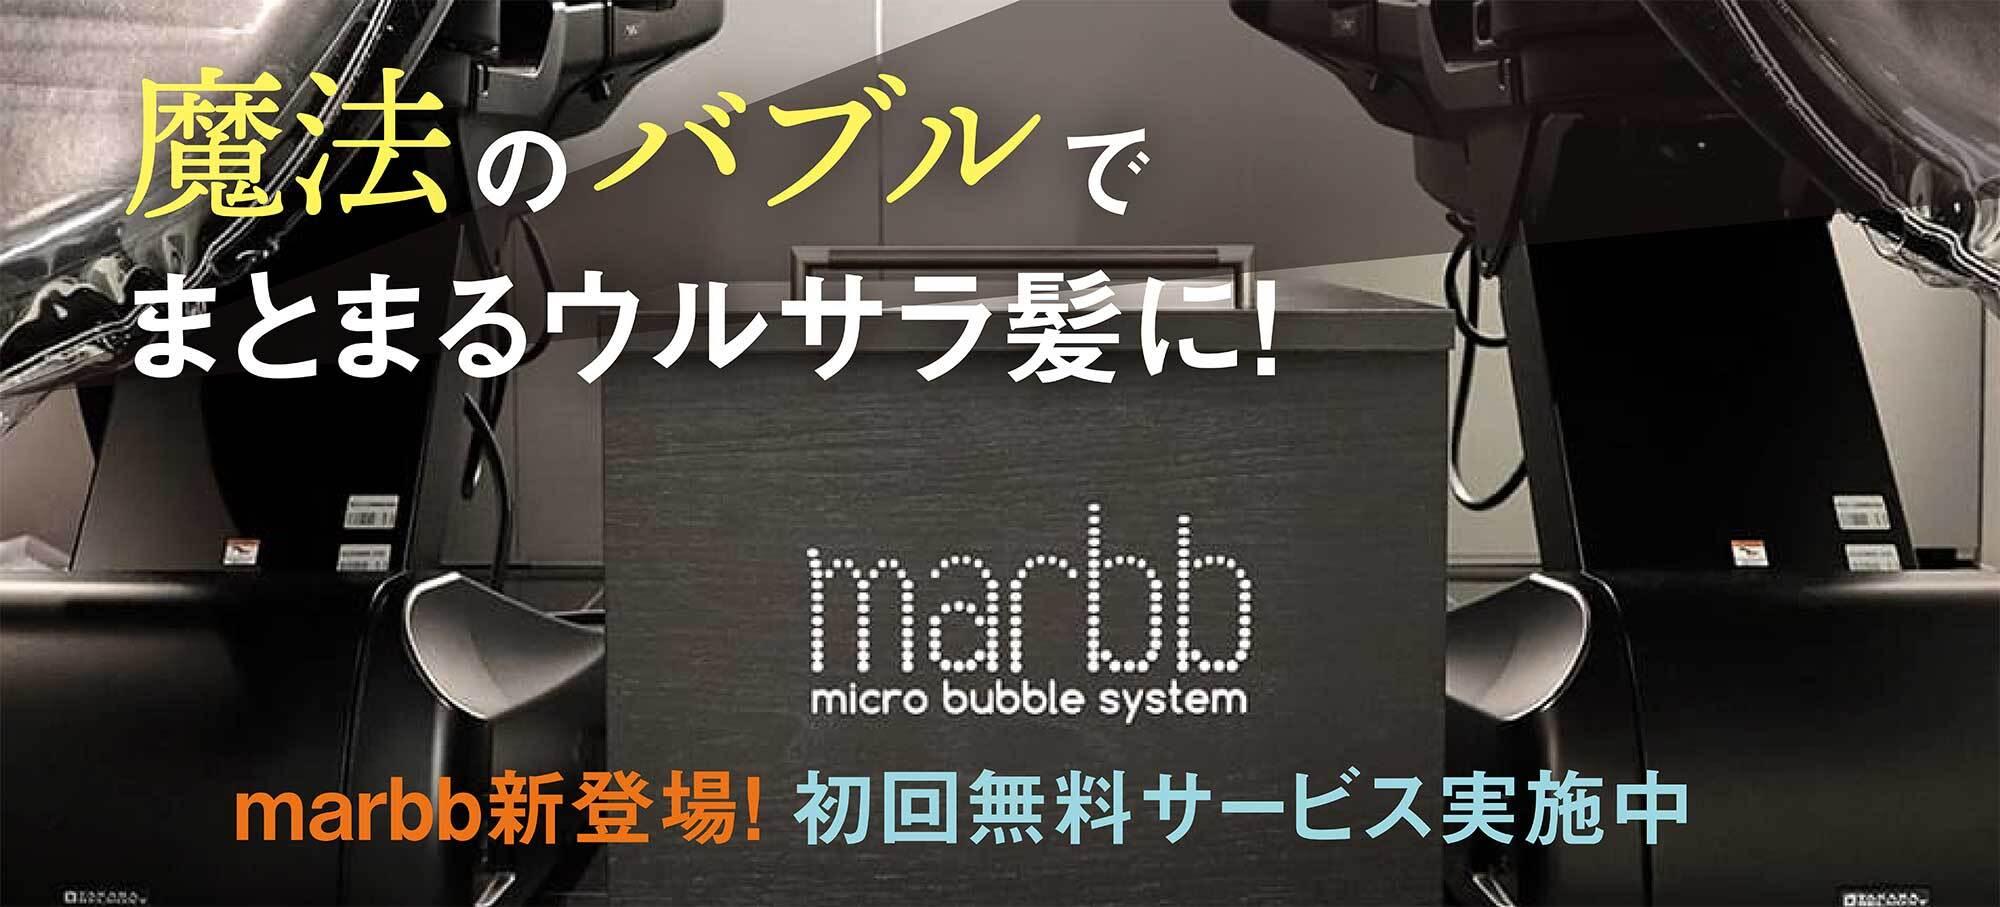 marbb link banner